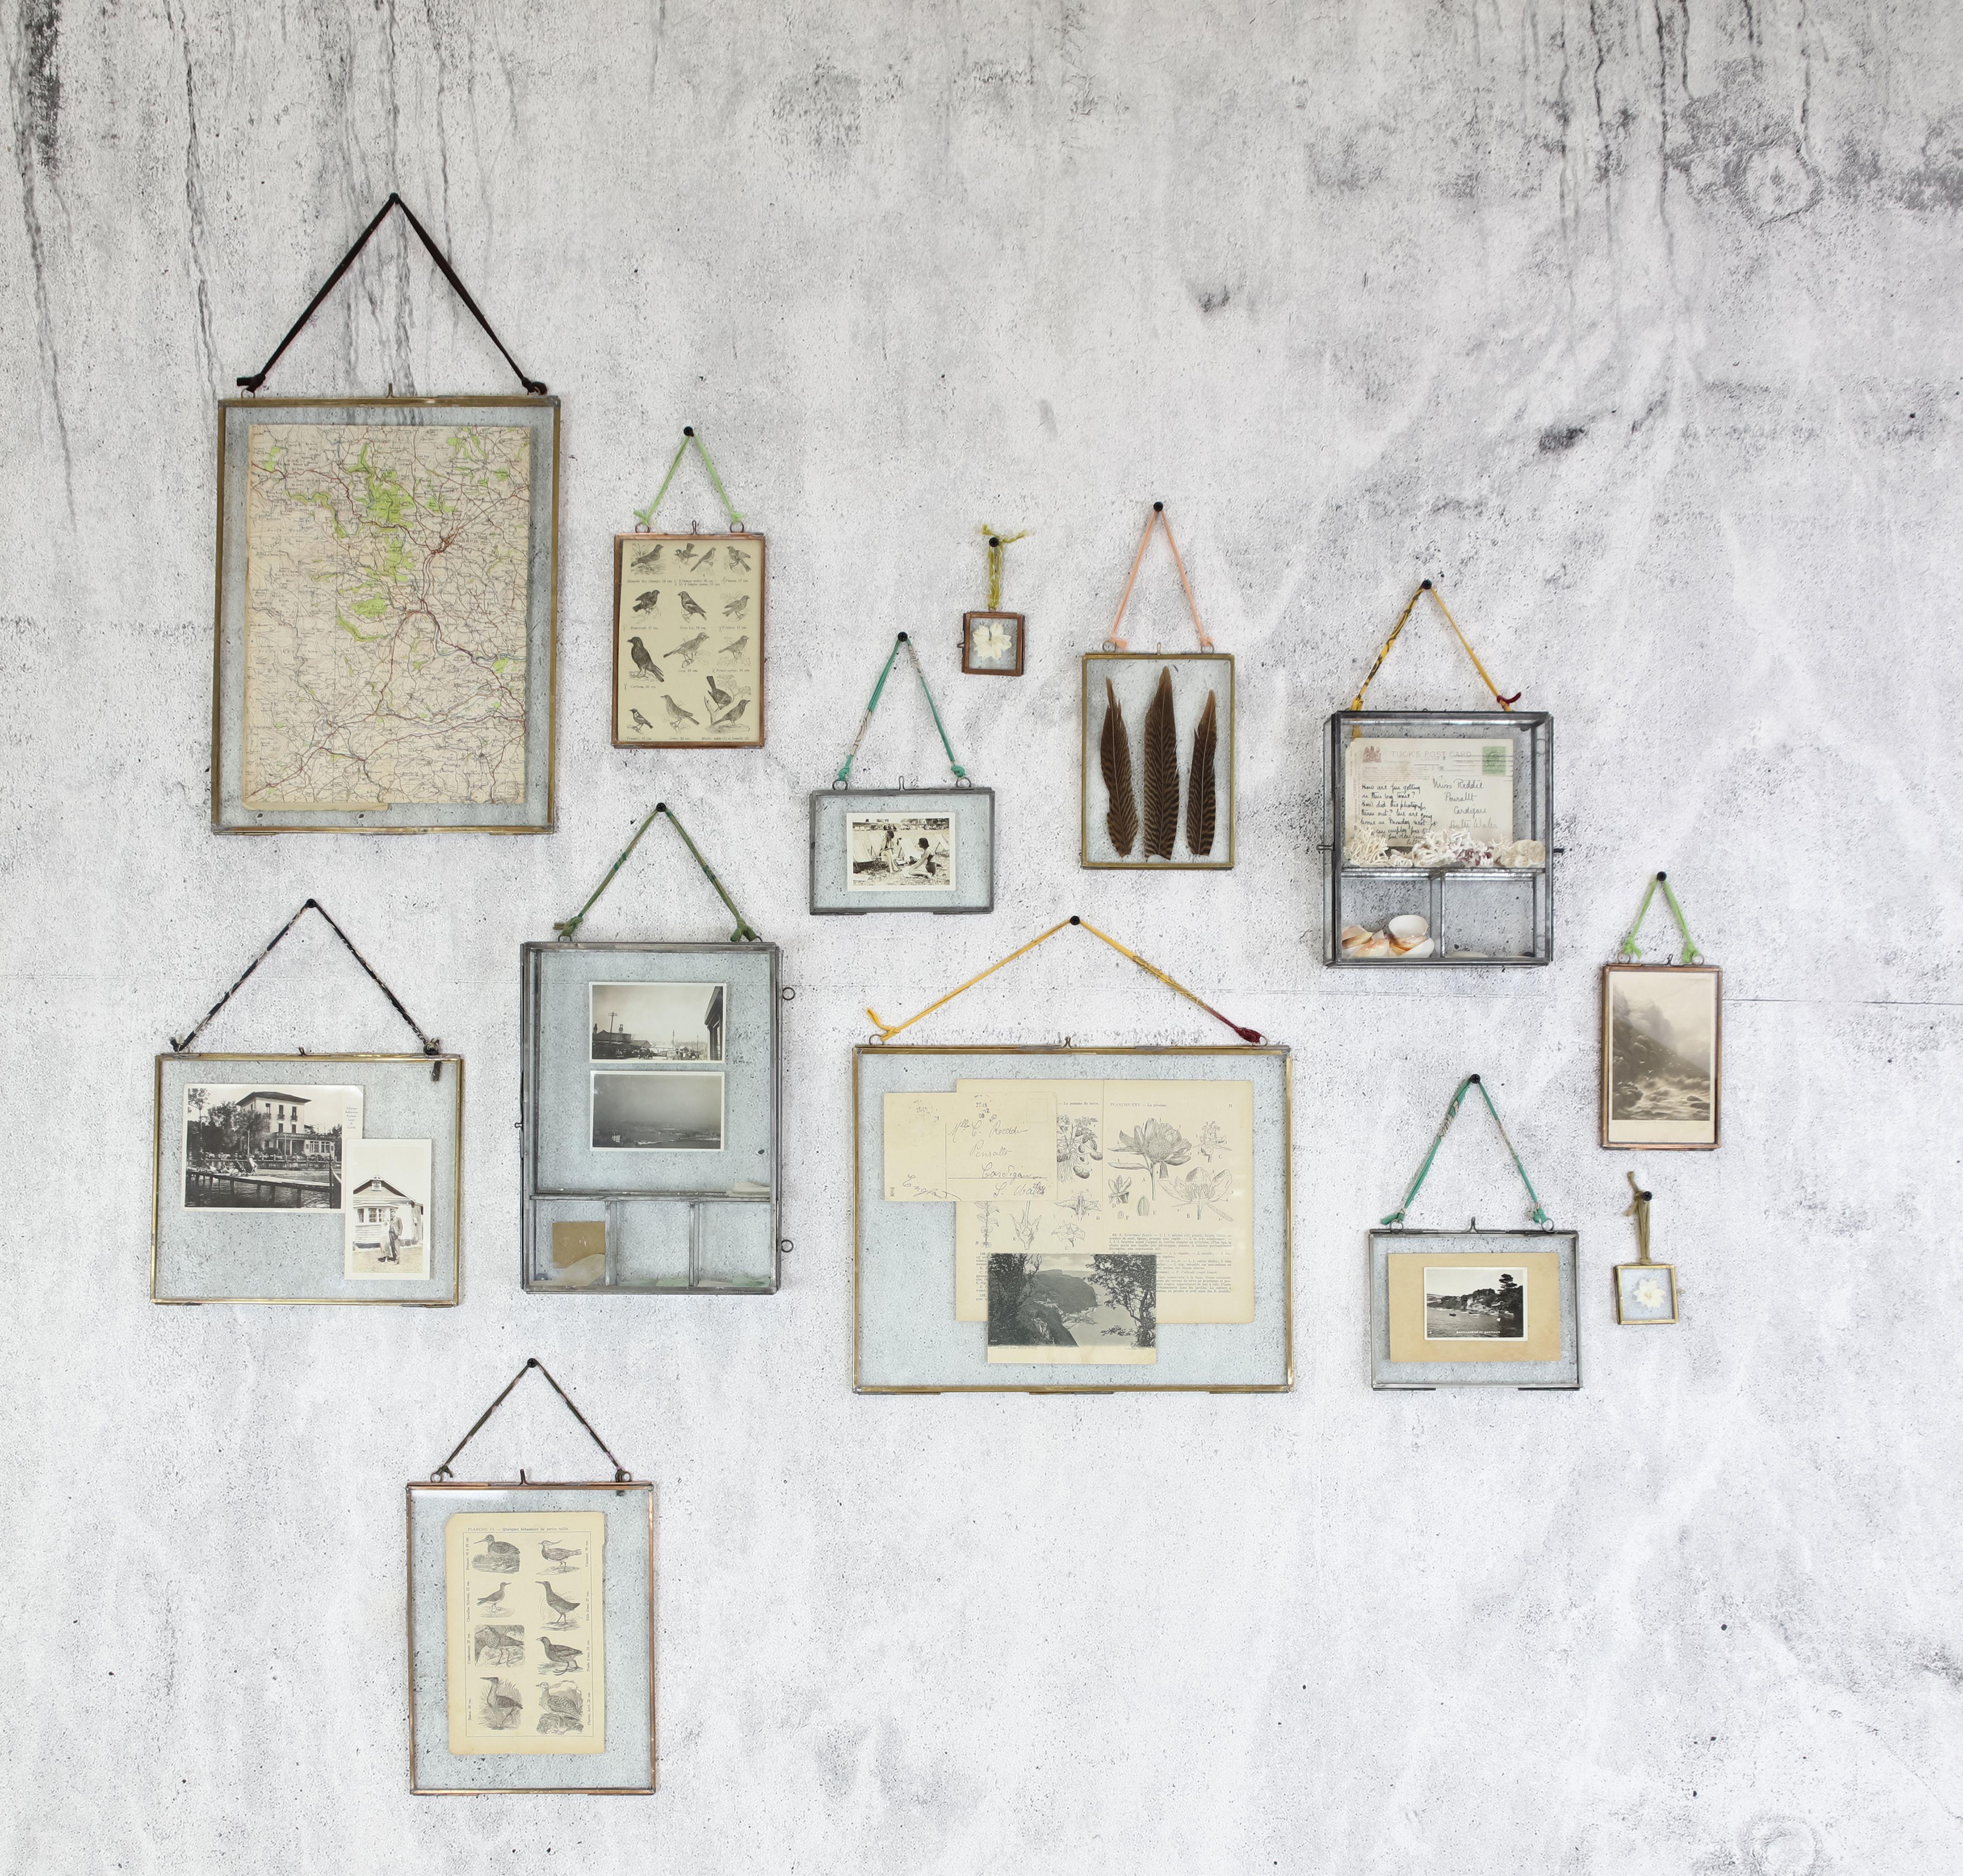 Kiko Zinc Frame in 2018 | Cute ides | Pinterest | Frame, Home and Decor